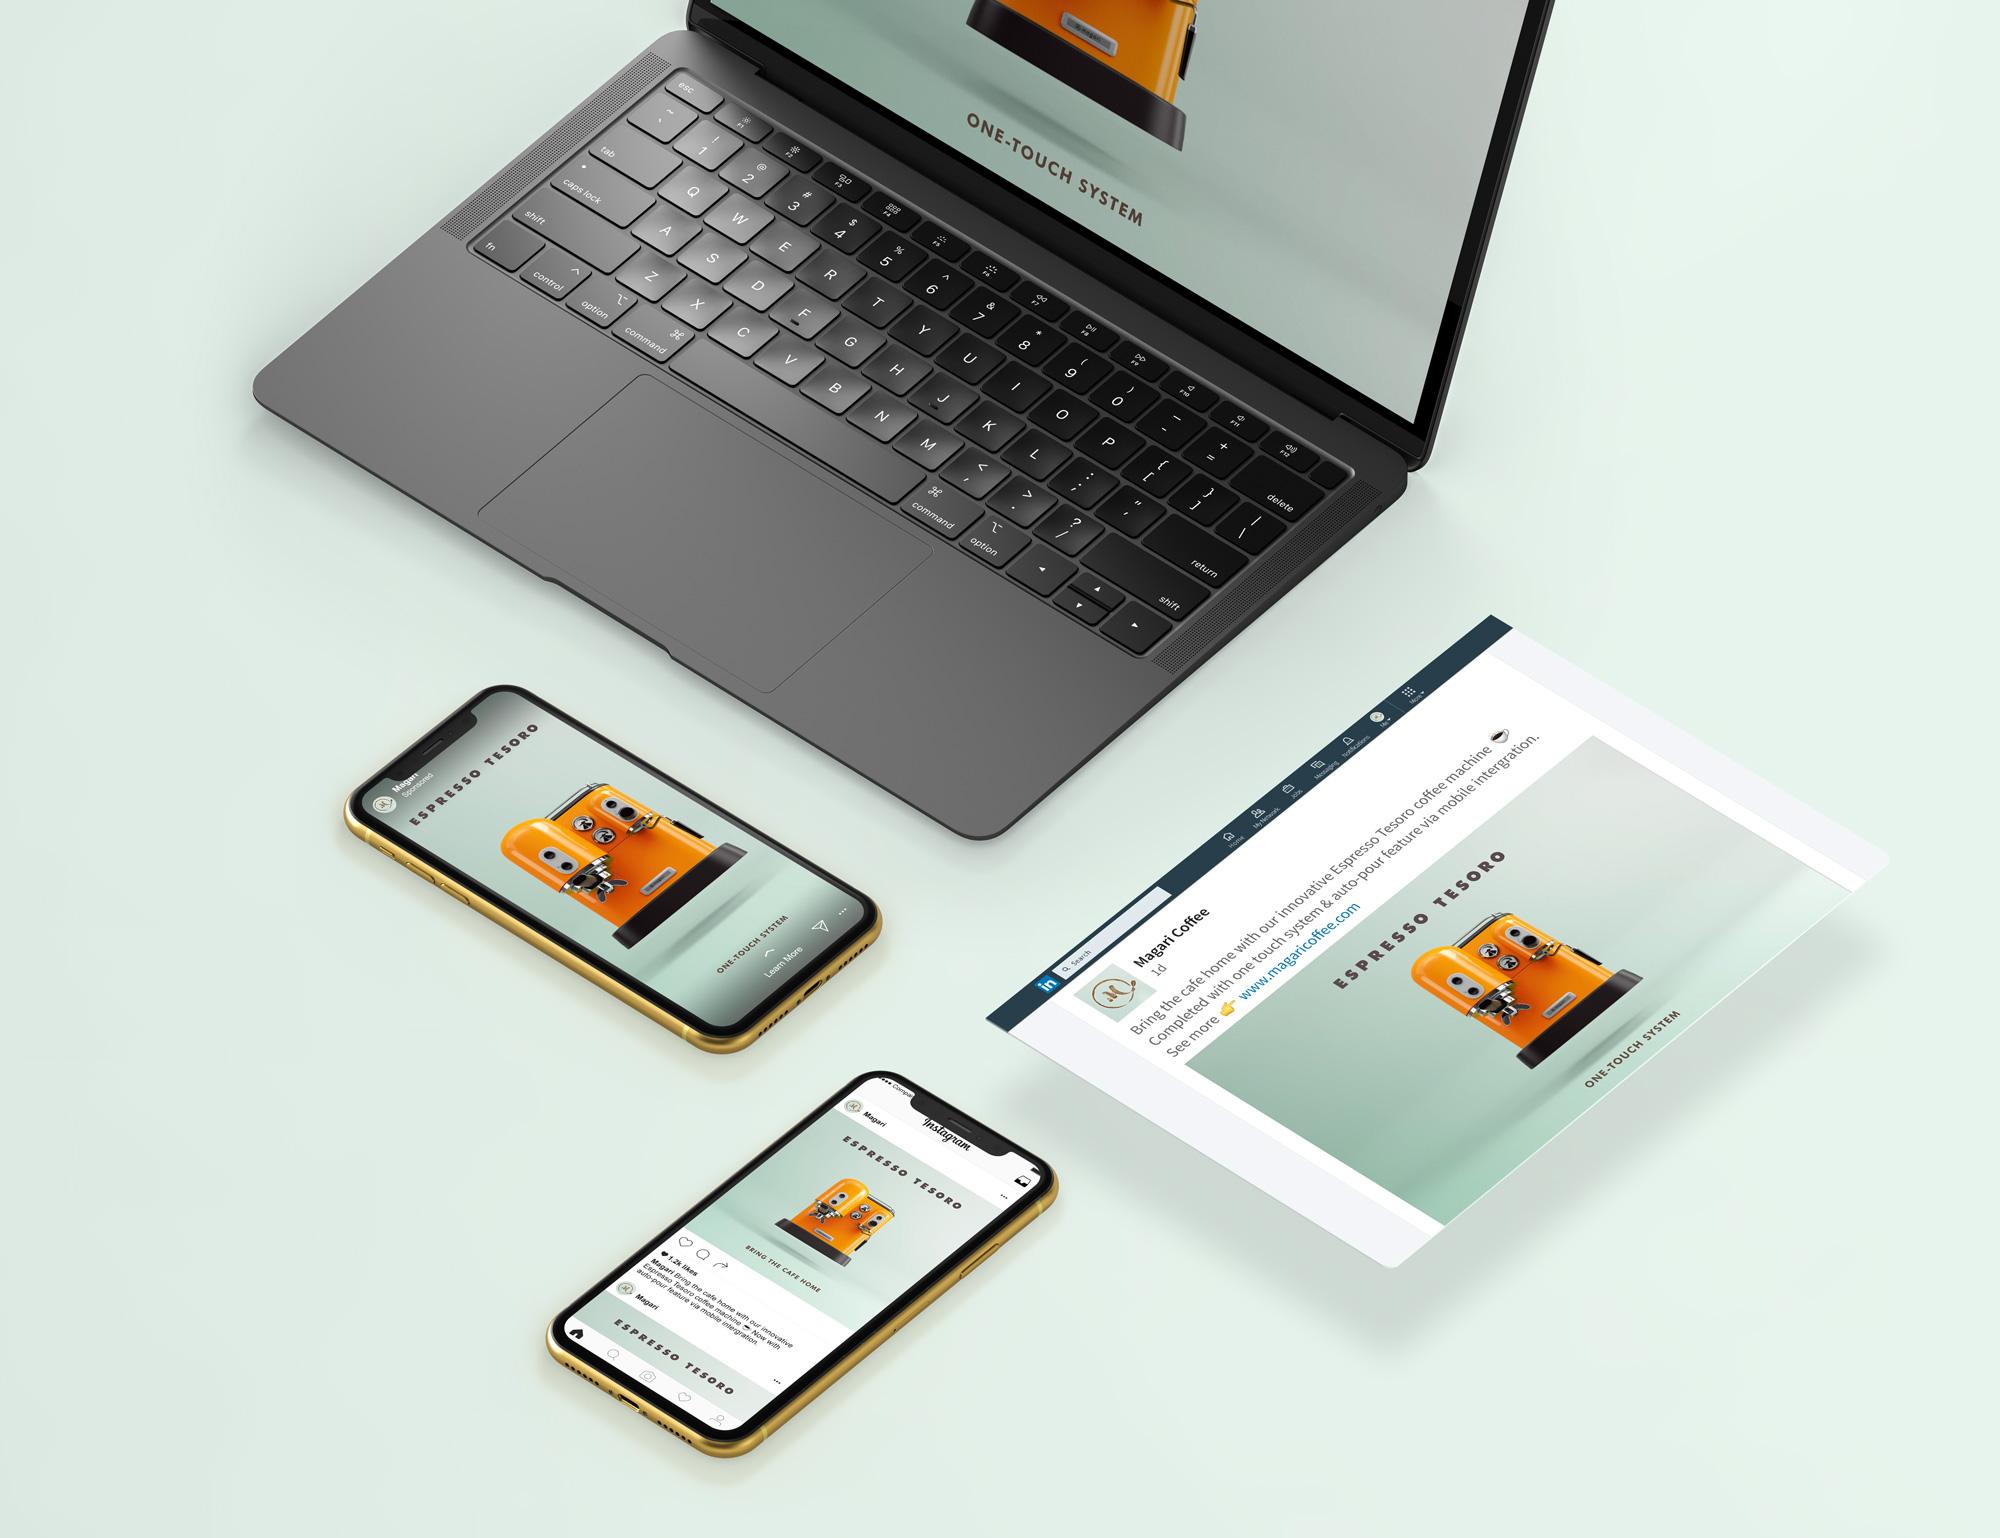 lumeo-showcase-devices.jpg